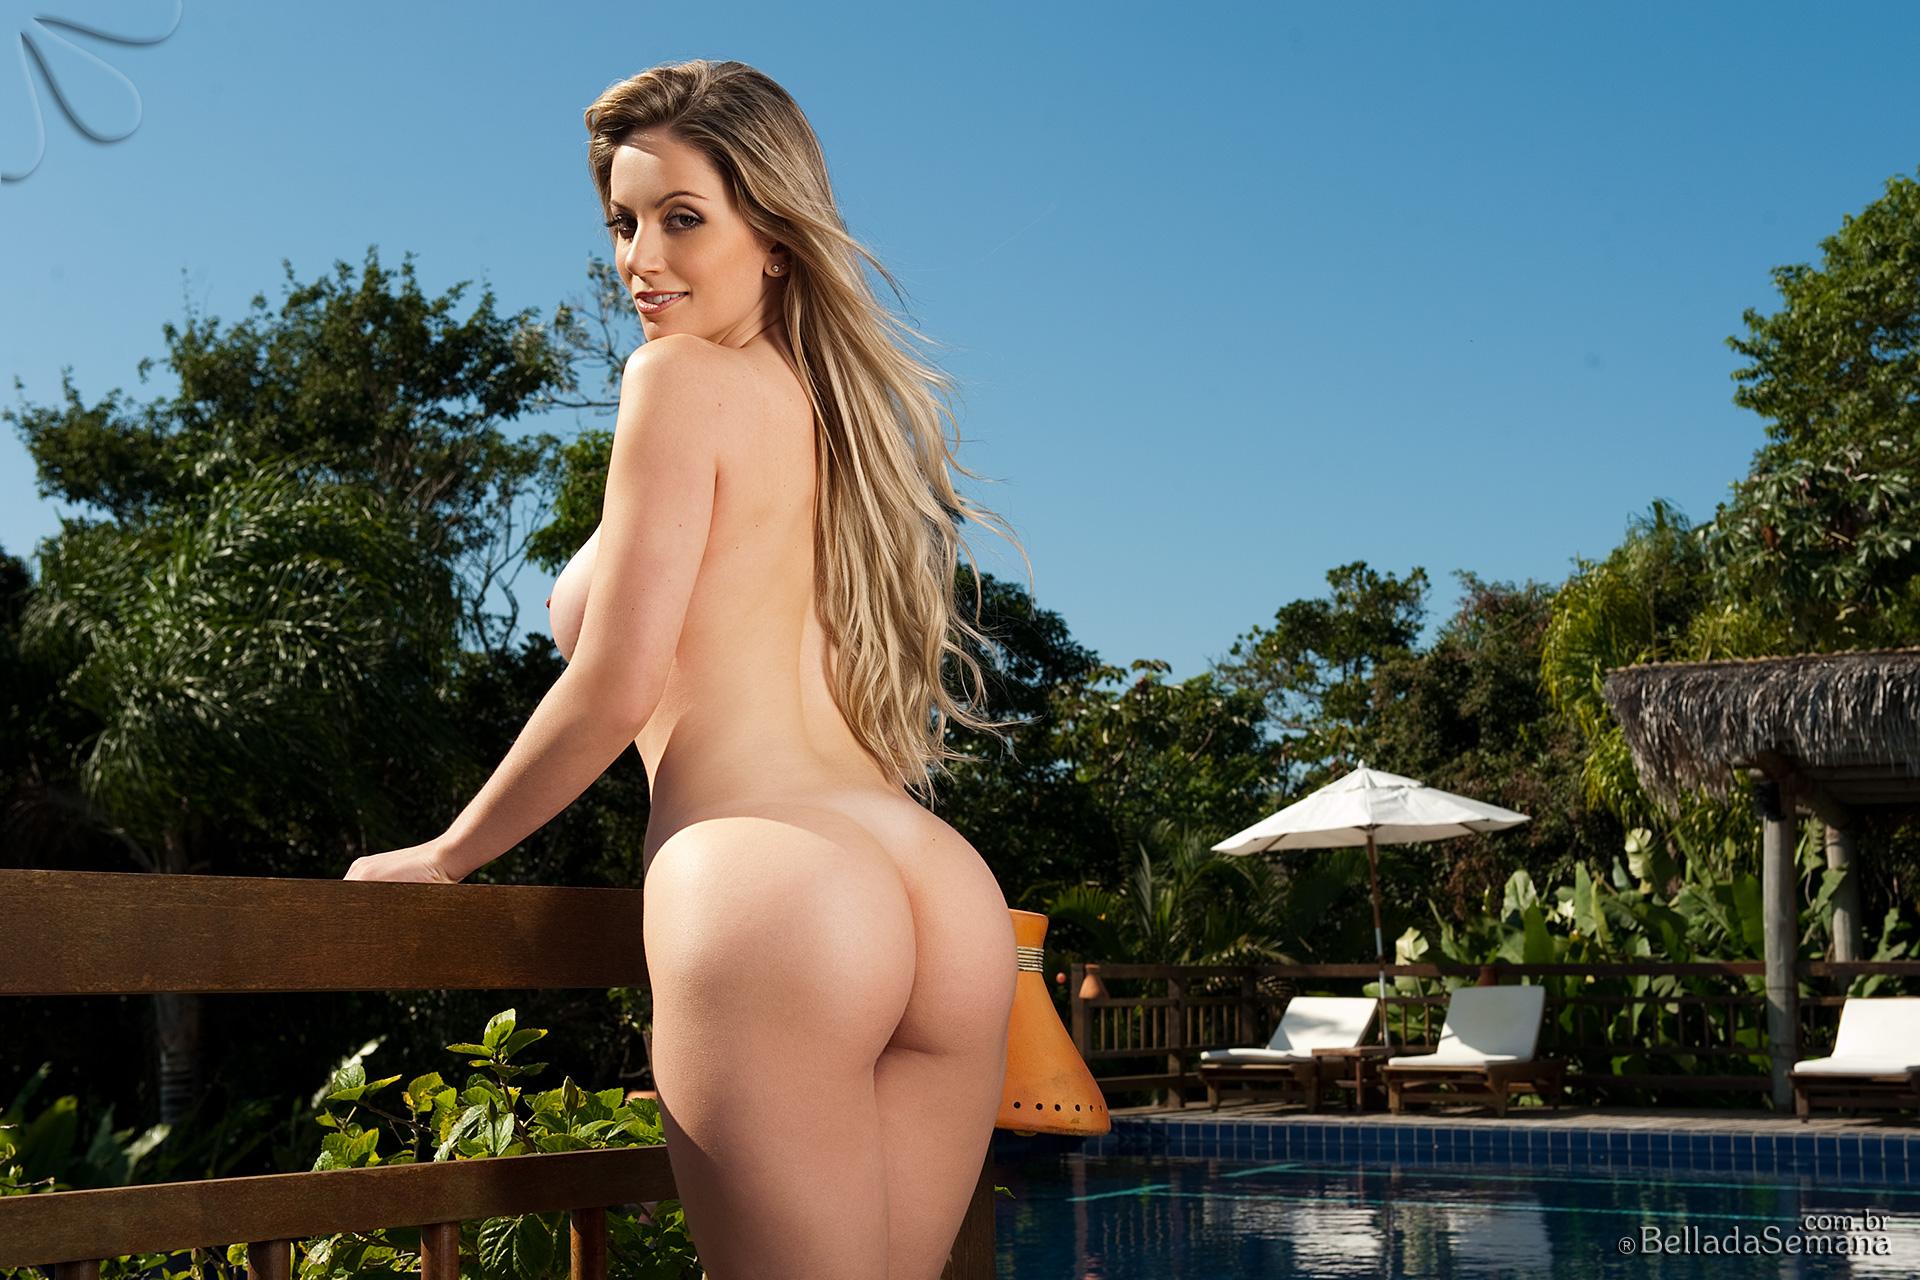 Franciele Perao, blonde, strip, nude, busty, ass, bikini